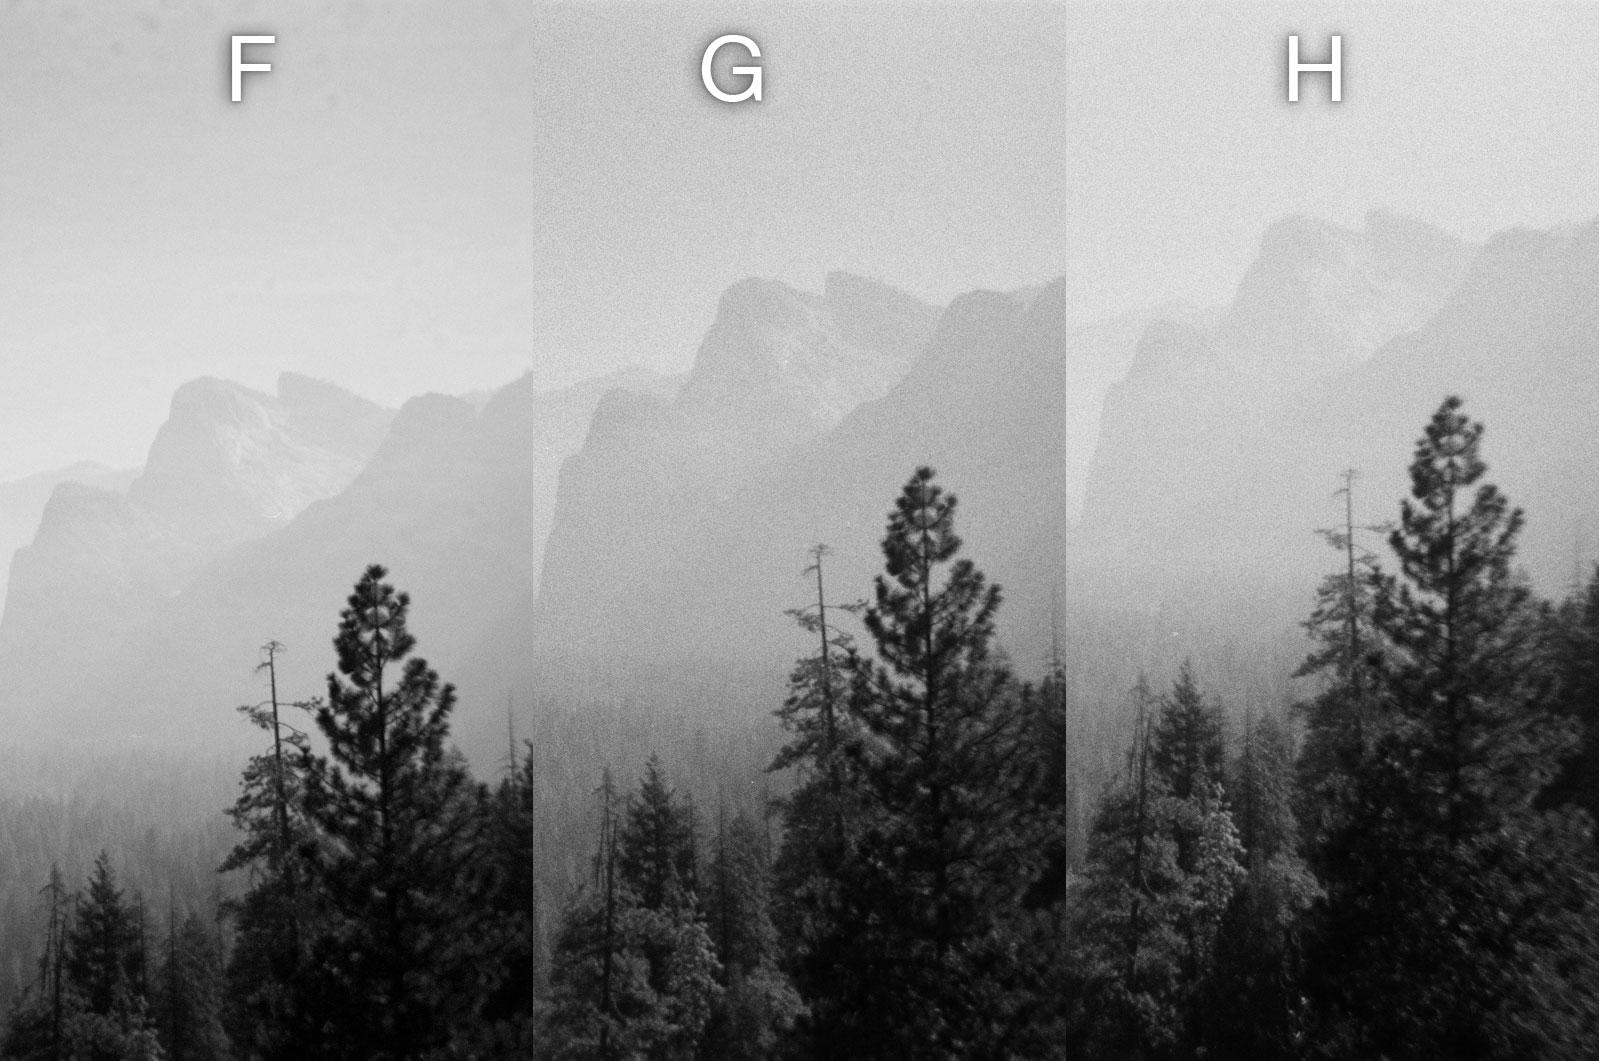 Disposable Single Use Cameras B&W Photo Comparison - Landscape